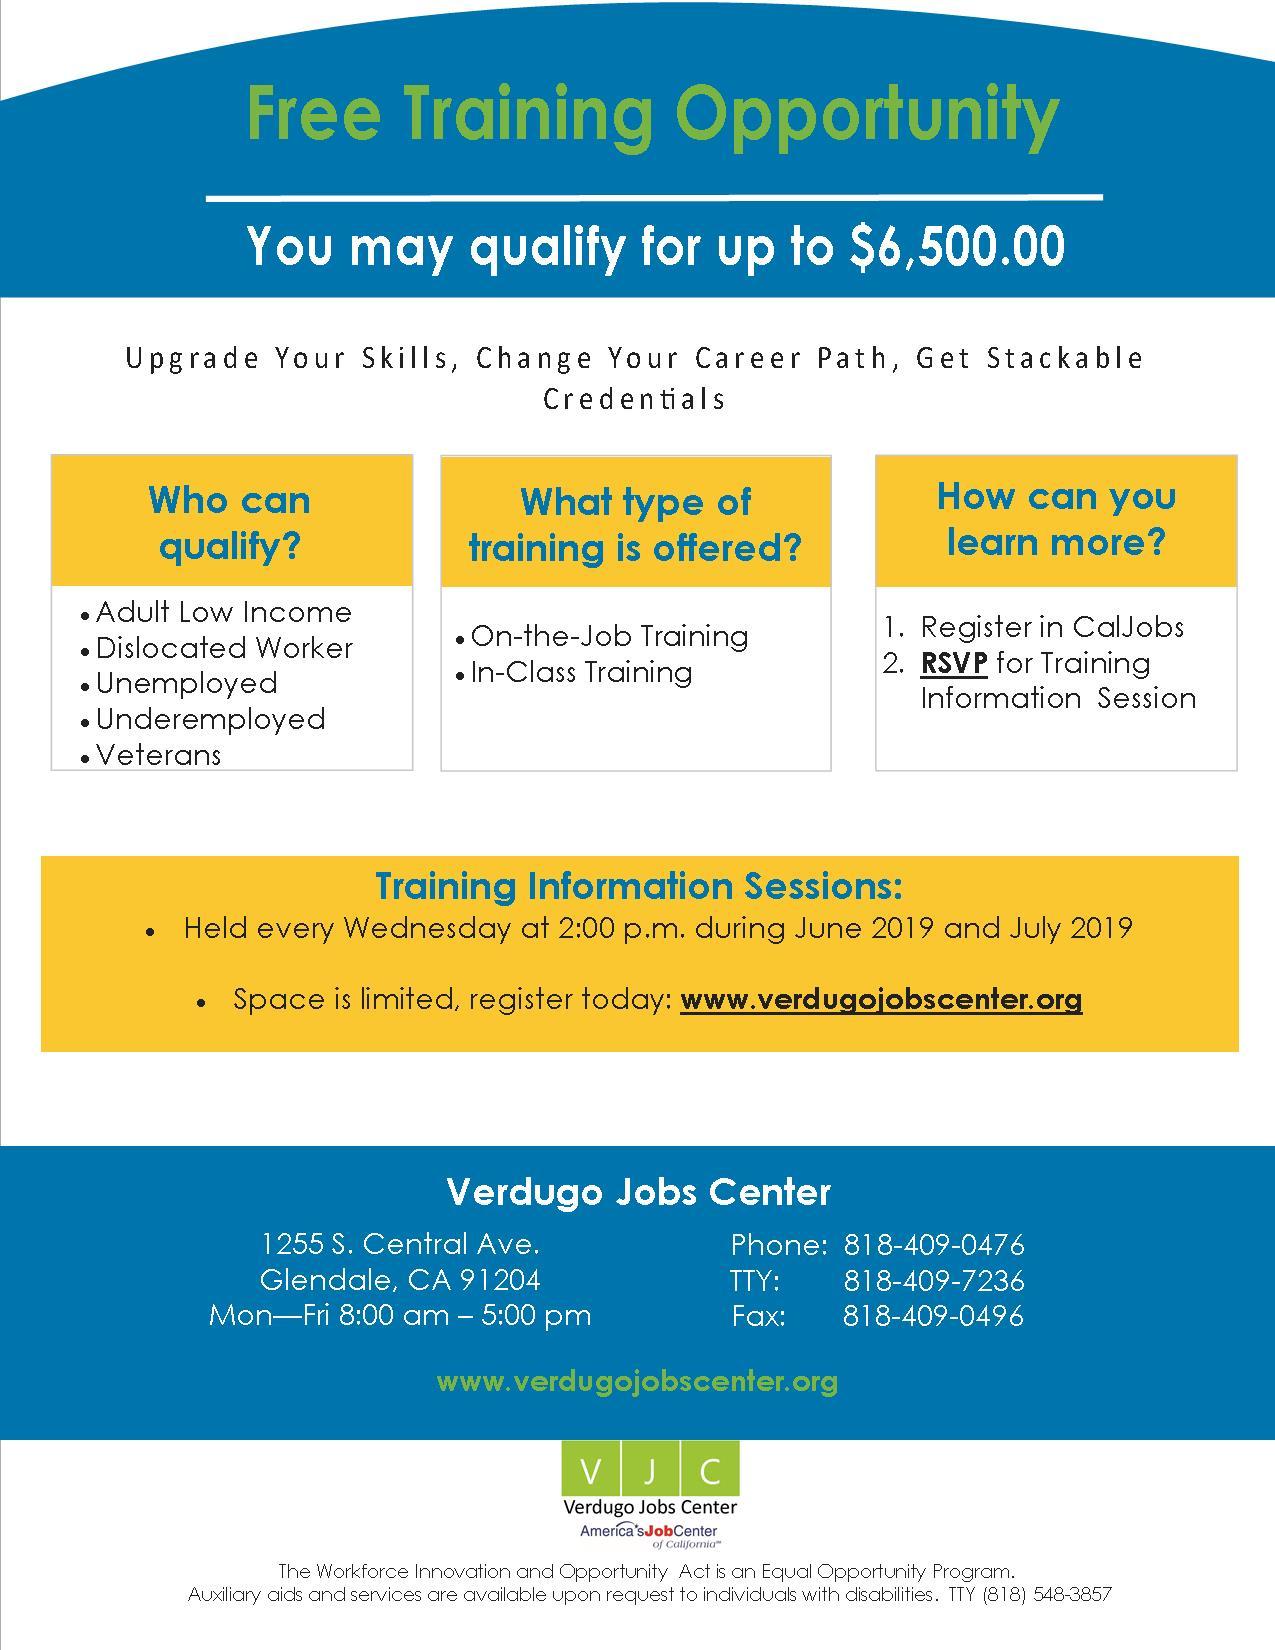 Verdugo Jobs Center | City of Glendale, CA